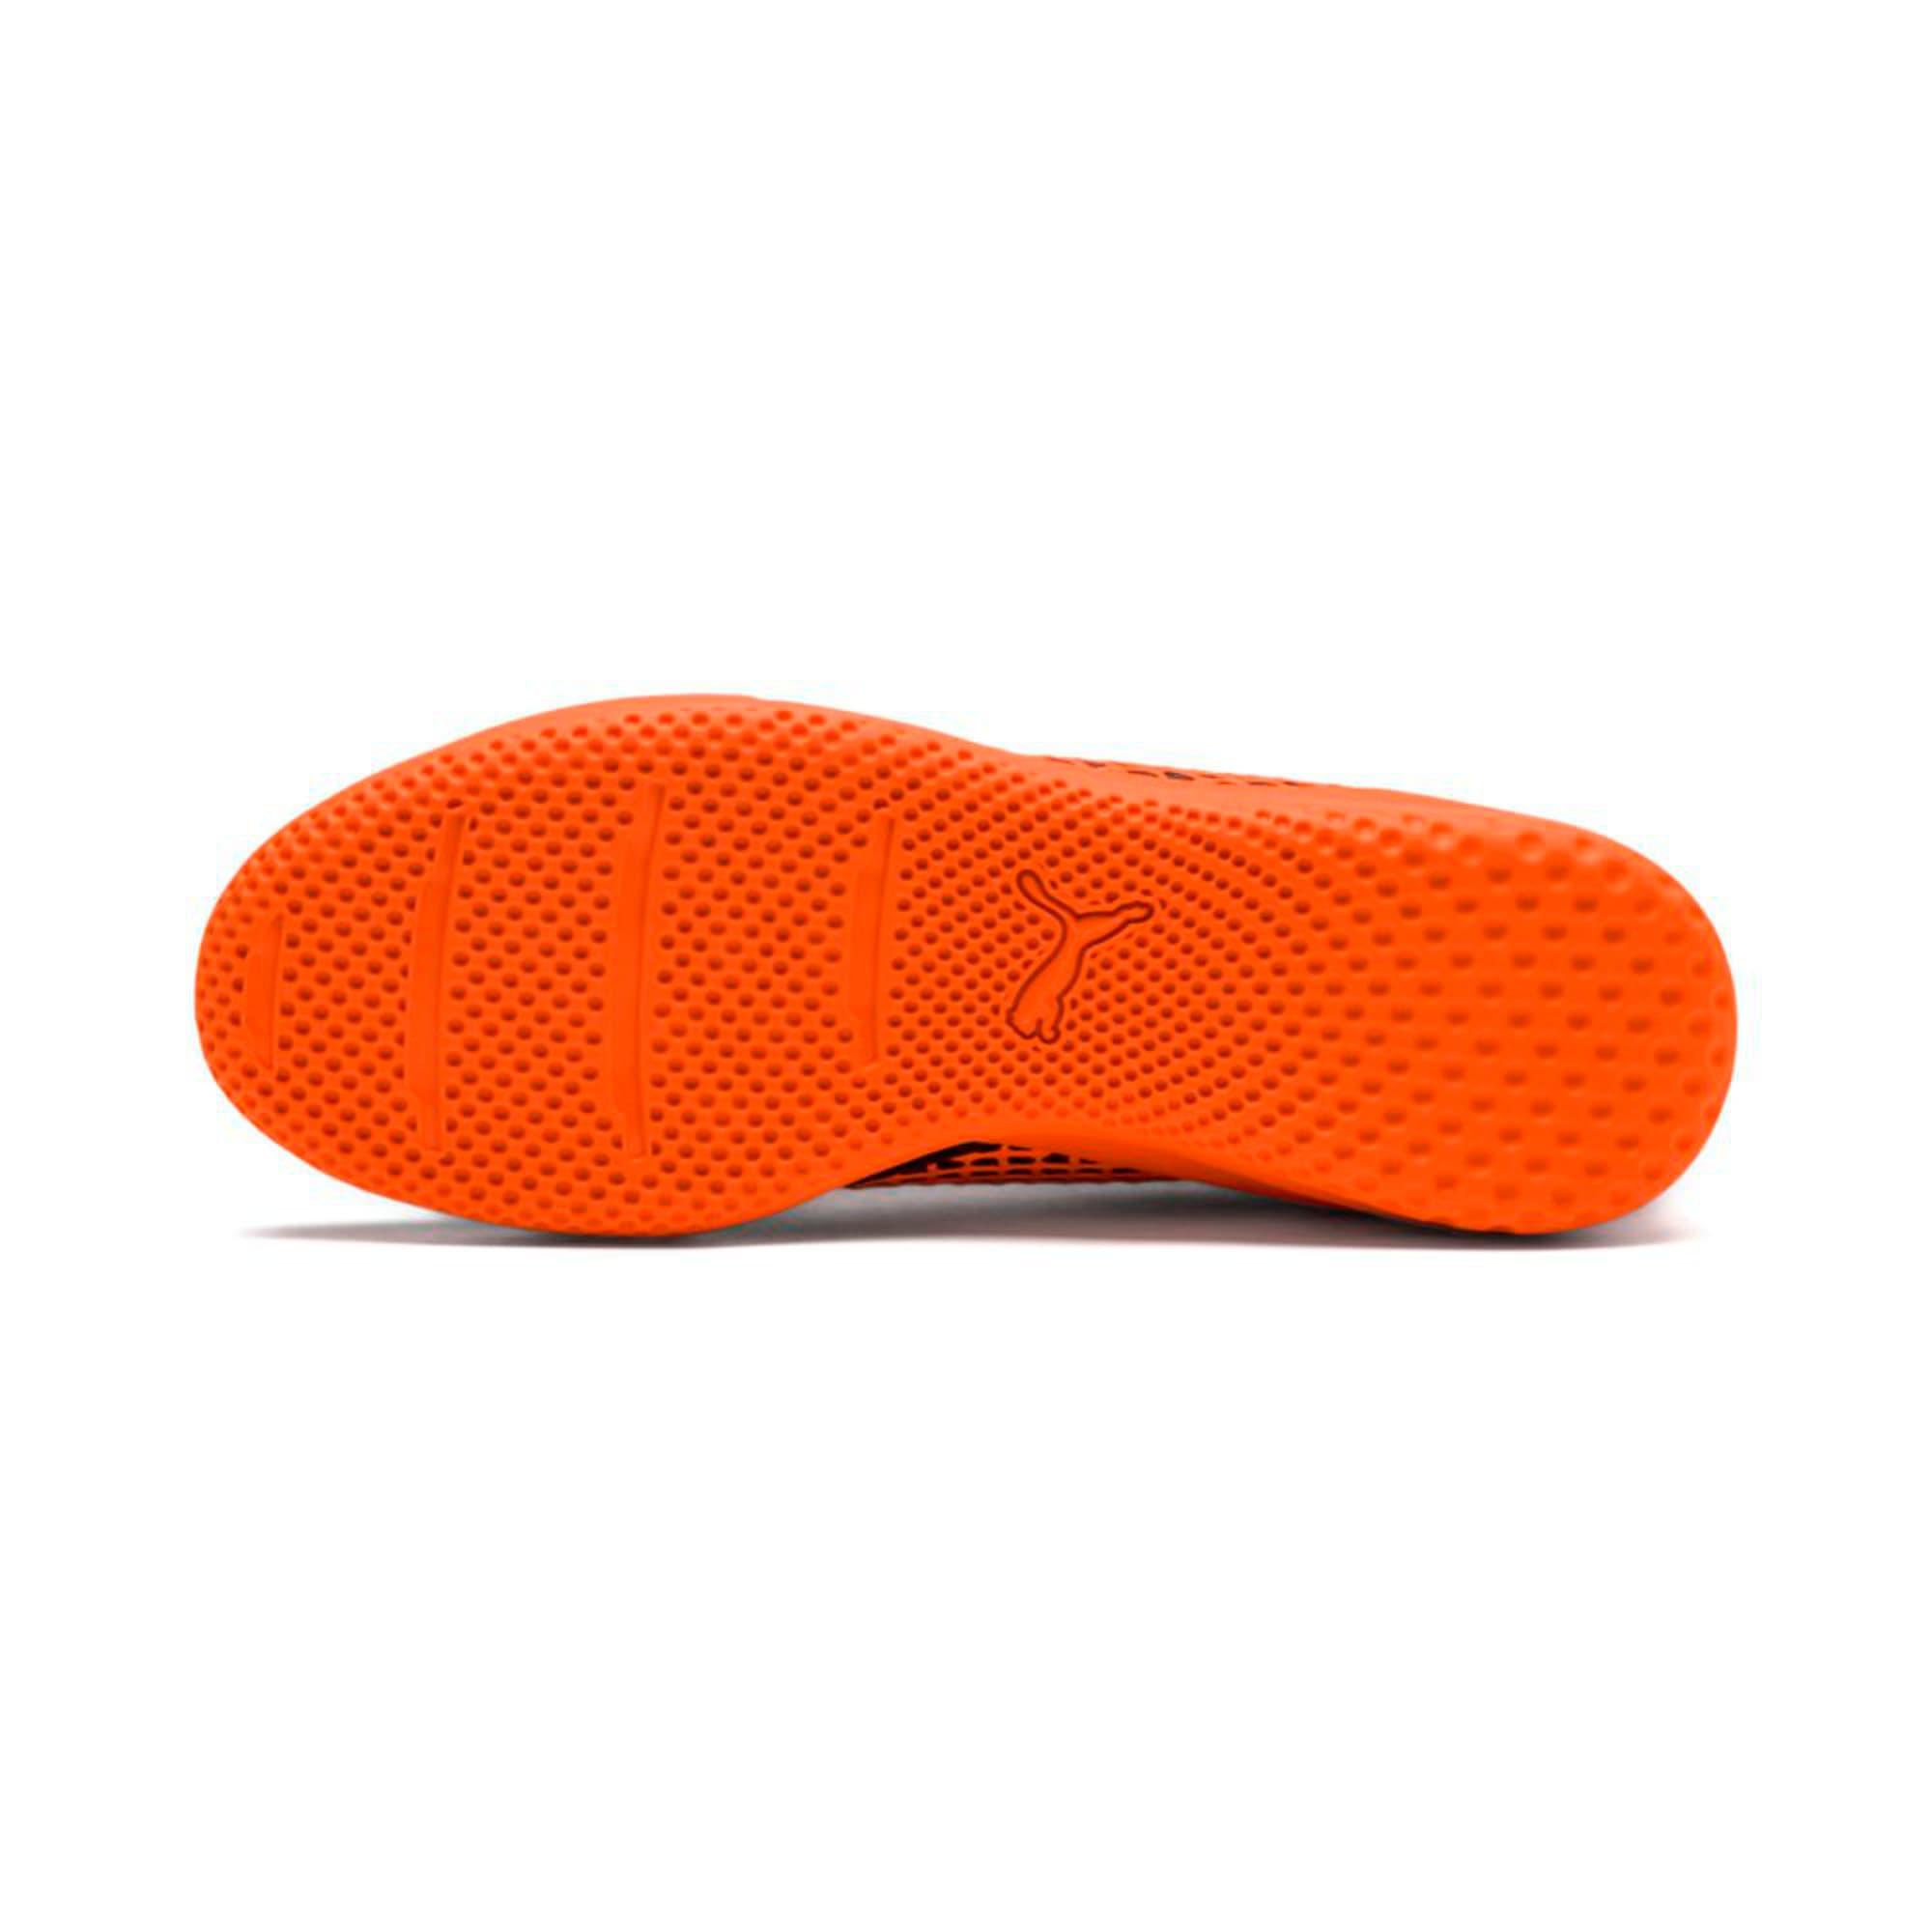 Thumbnail 2 of FUTURE 2.4 IT  Football Shoes, Black-Orange, medium-IND